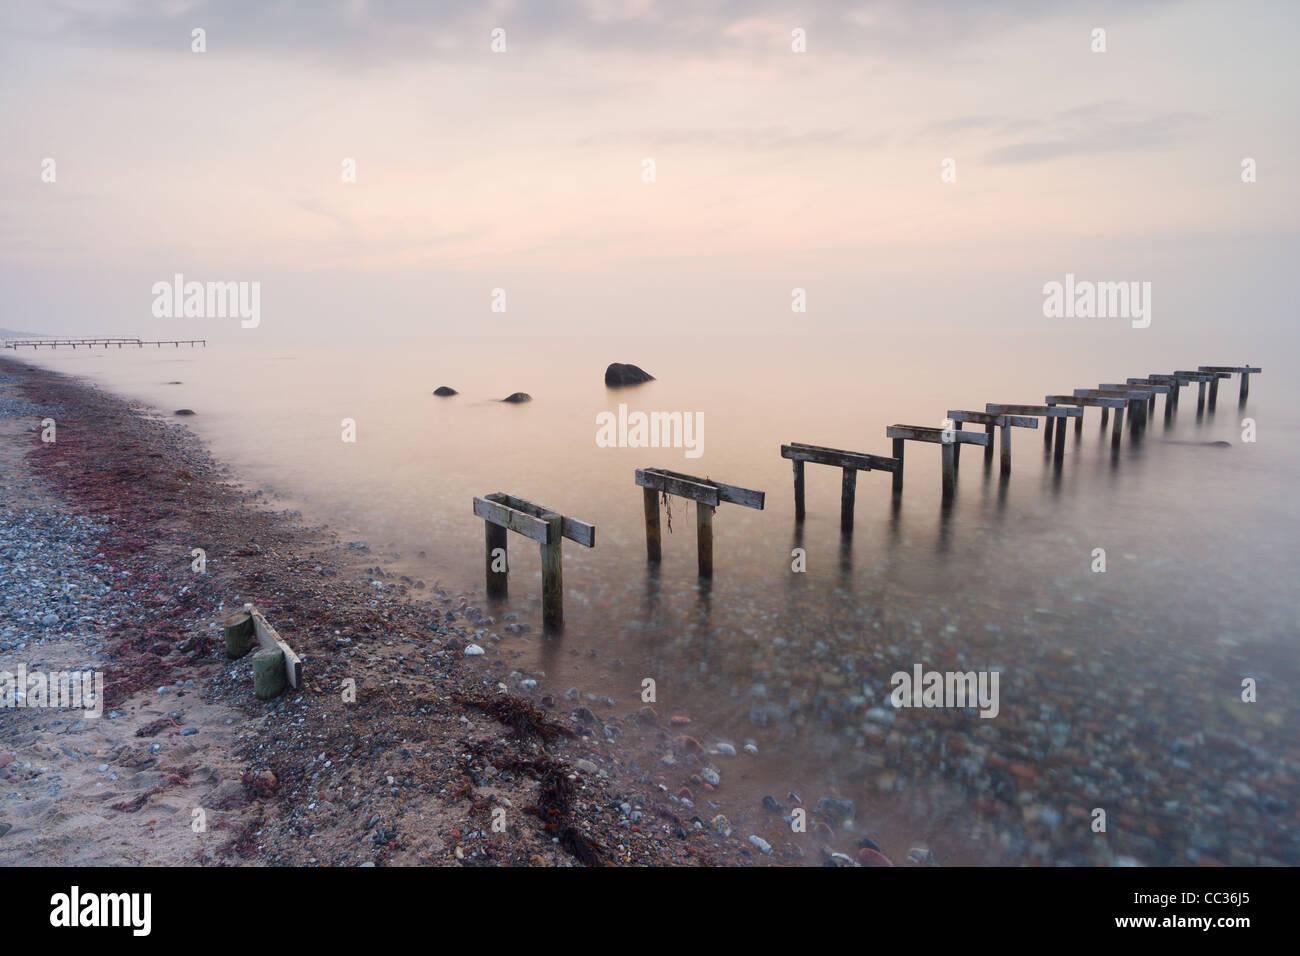 'Badebro' (bathing bridge), or a bathing jetty, on Smidstrup Strand near Gilleleje, North Zealand, Denmark. - Stock Image